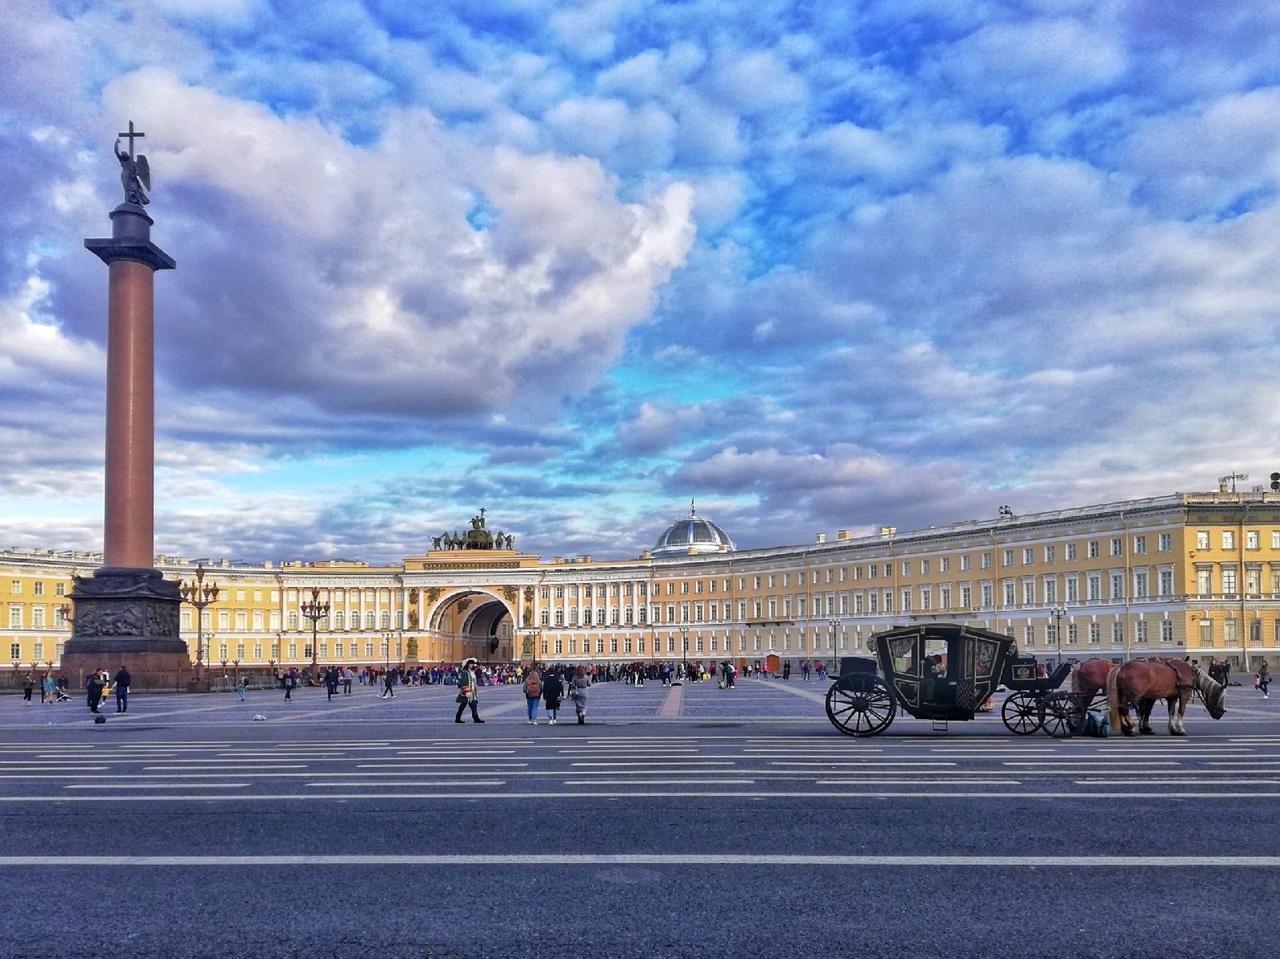 Зимний Дворец - Россия > Санкт-Петербург - ЭтоРетро.ru - старые ... | 959x1280